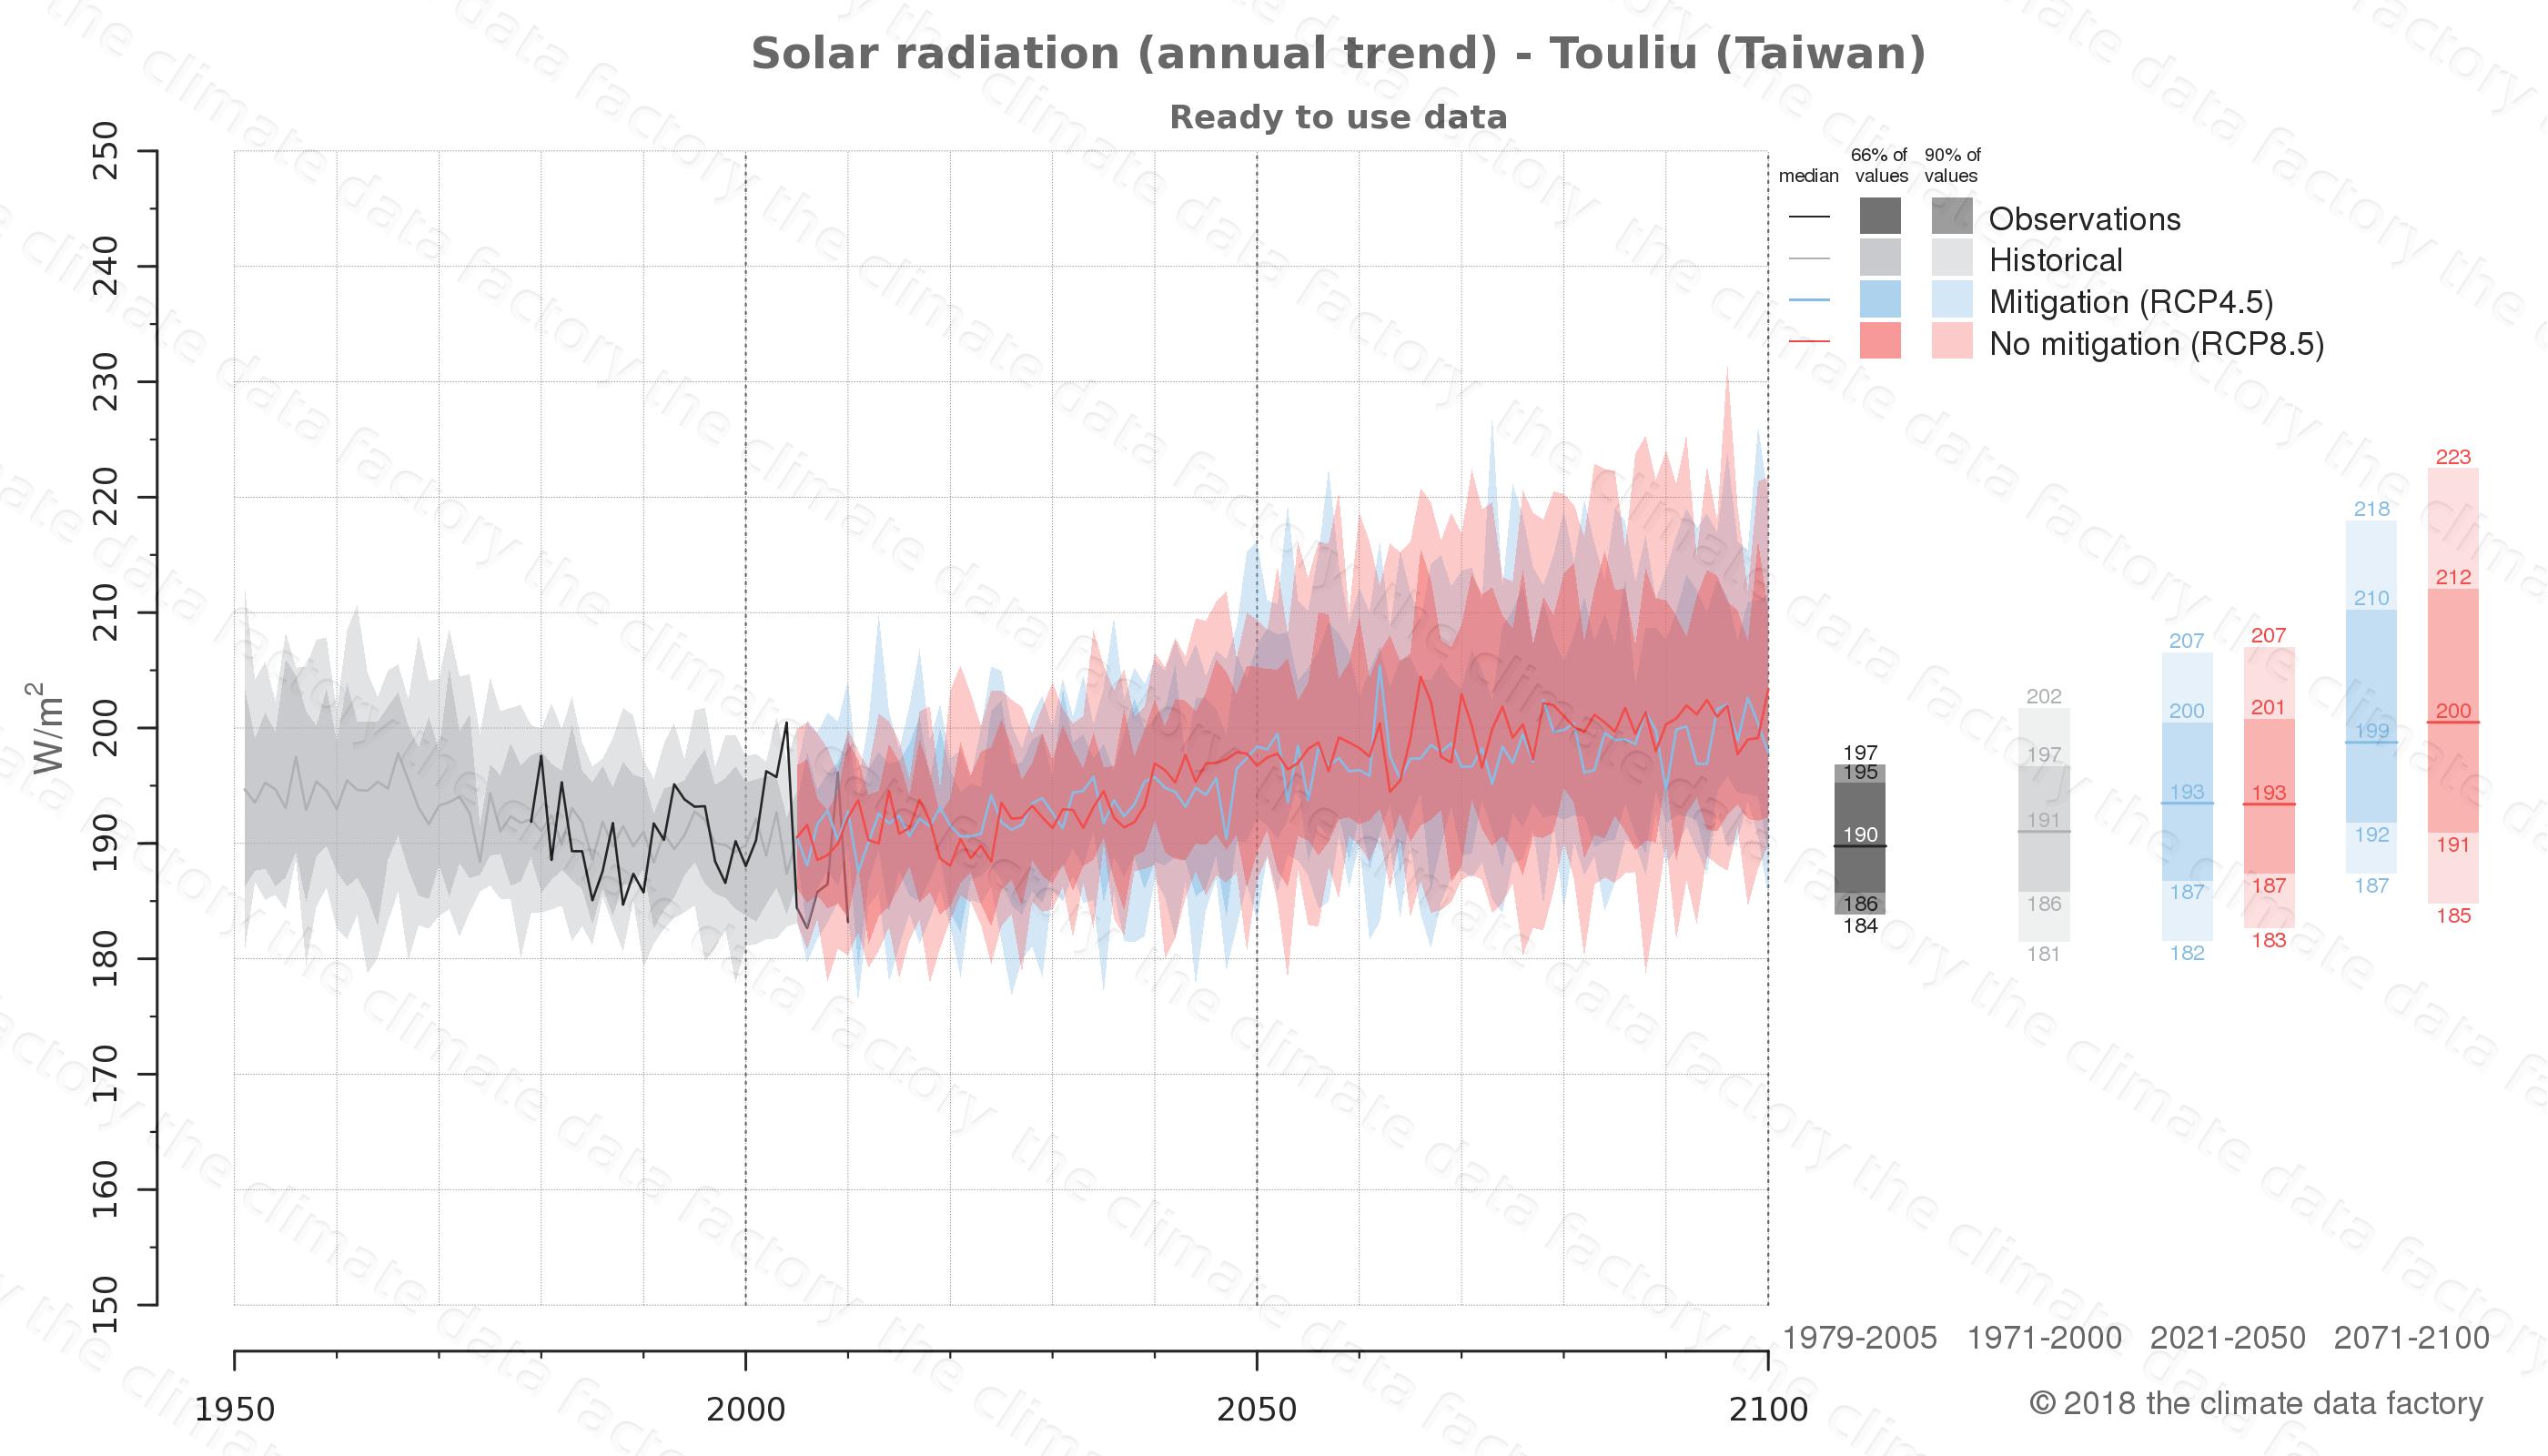 climate change data policy adaptation climate graph city data solar-radiation touliu taiwan